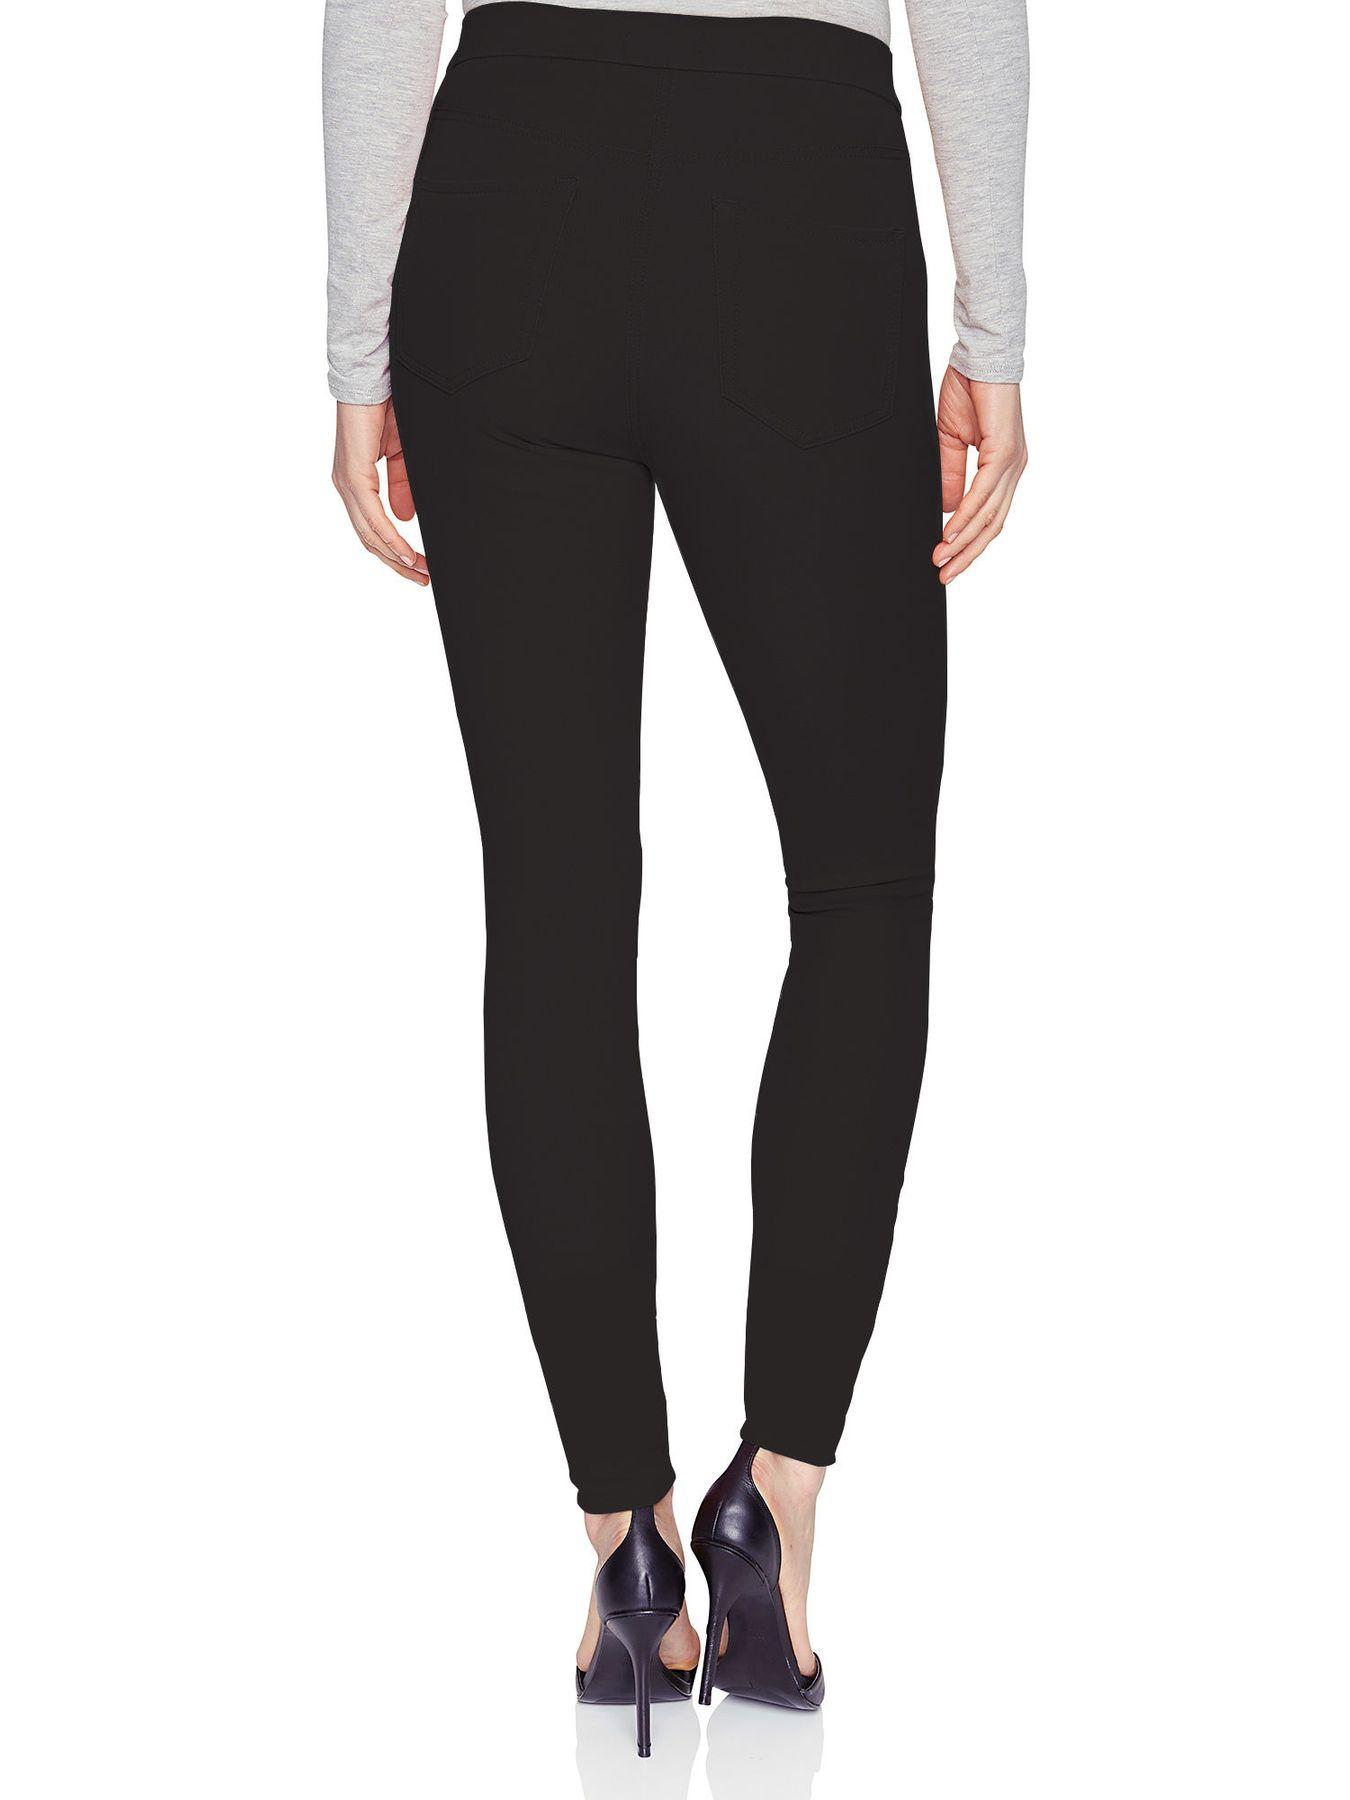 Atelier Gardeur - Skinny Fit - Damen -  verschiedene Farben, Zita3 (061925 ) – Bild 12